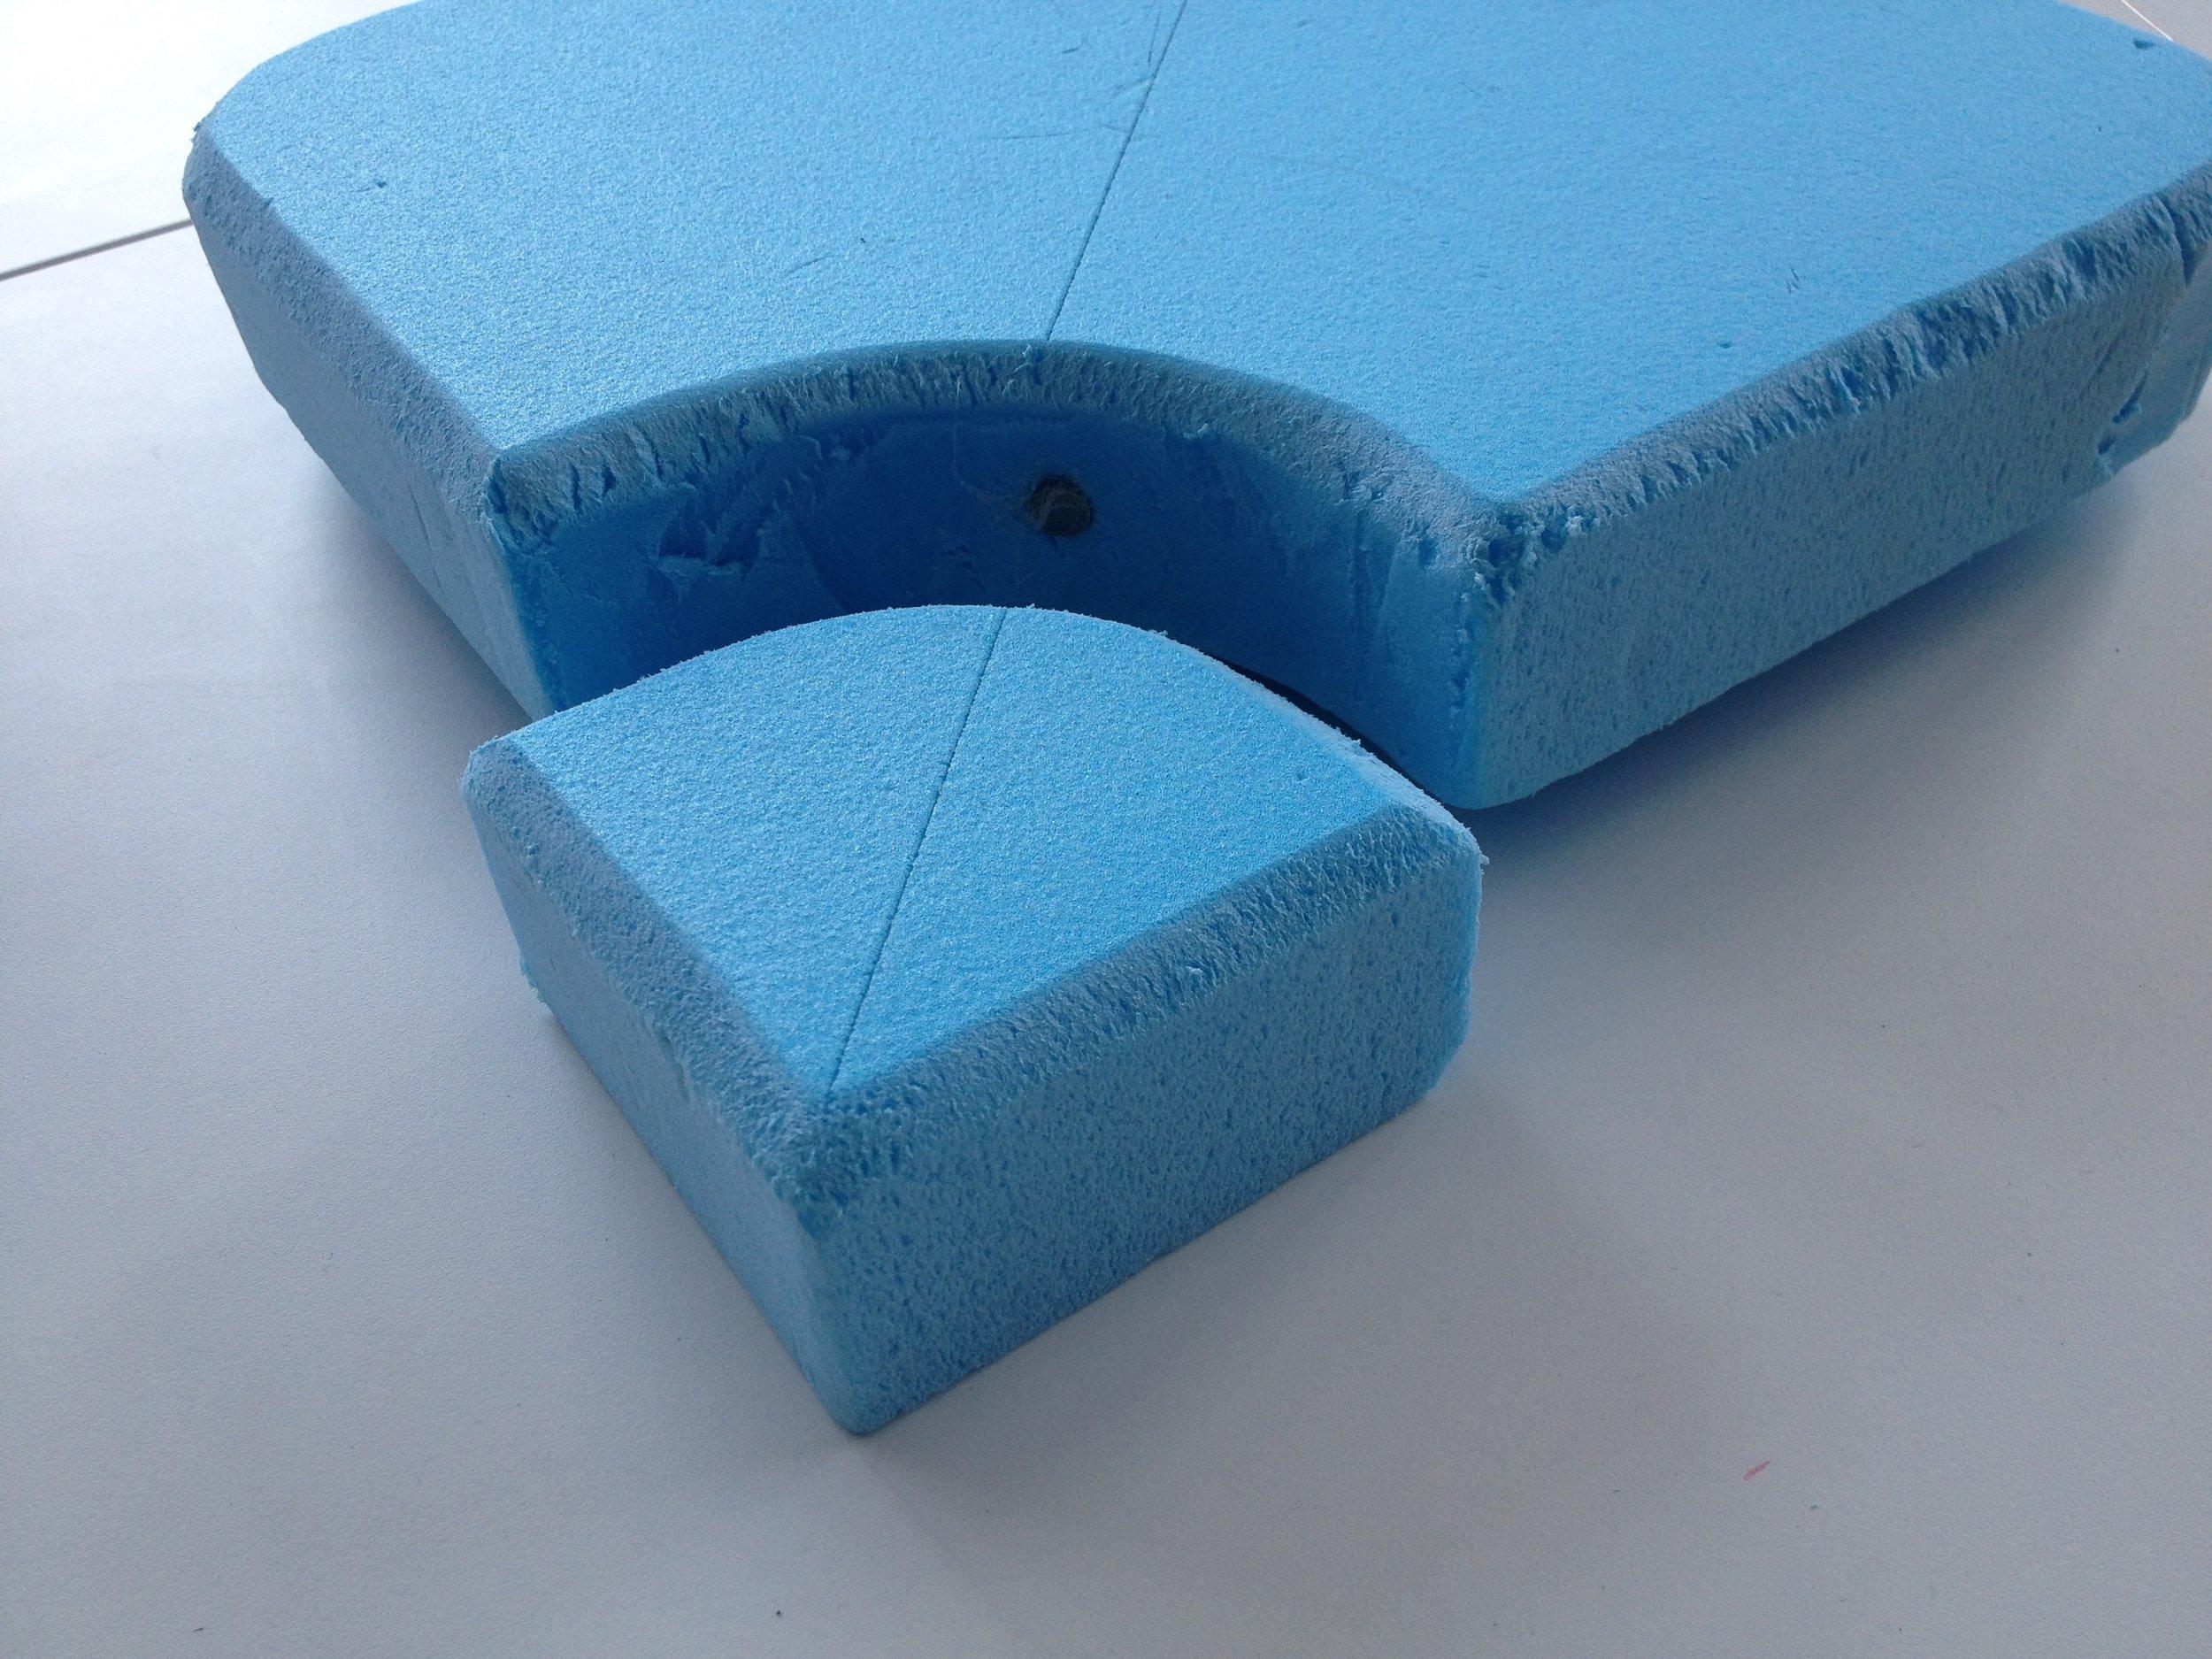 The first foam prototype